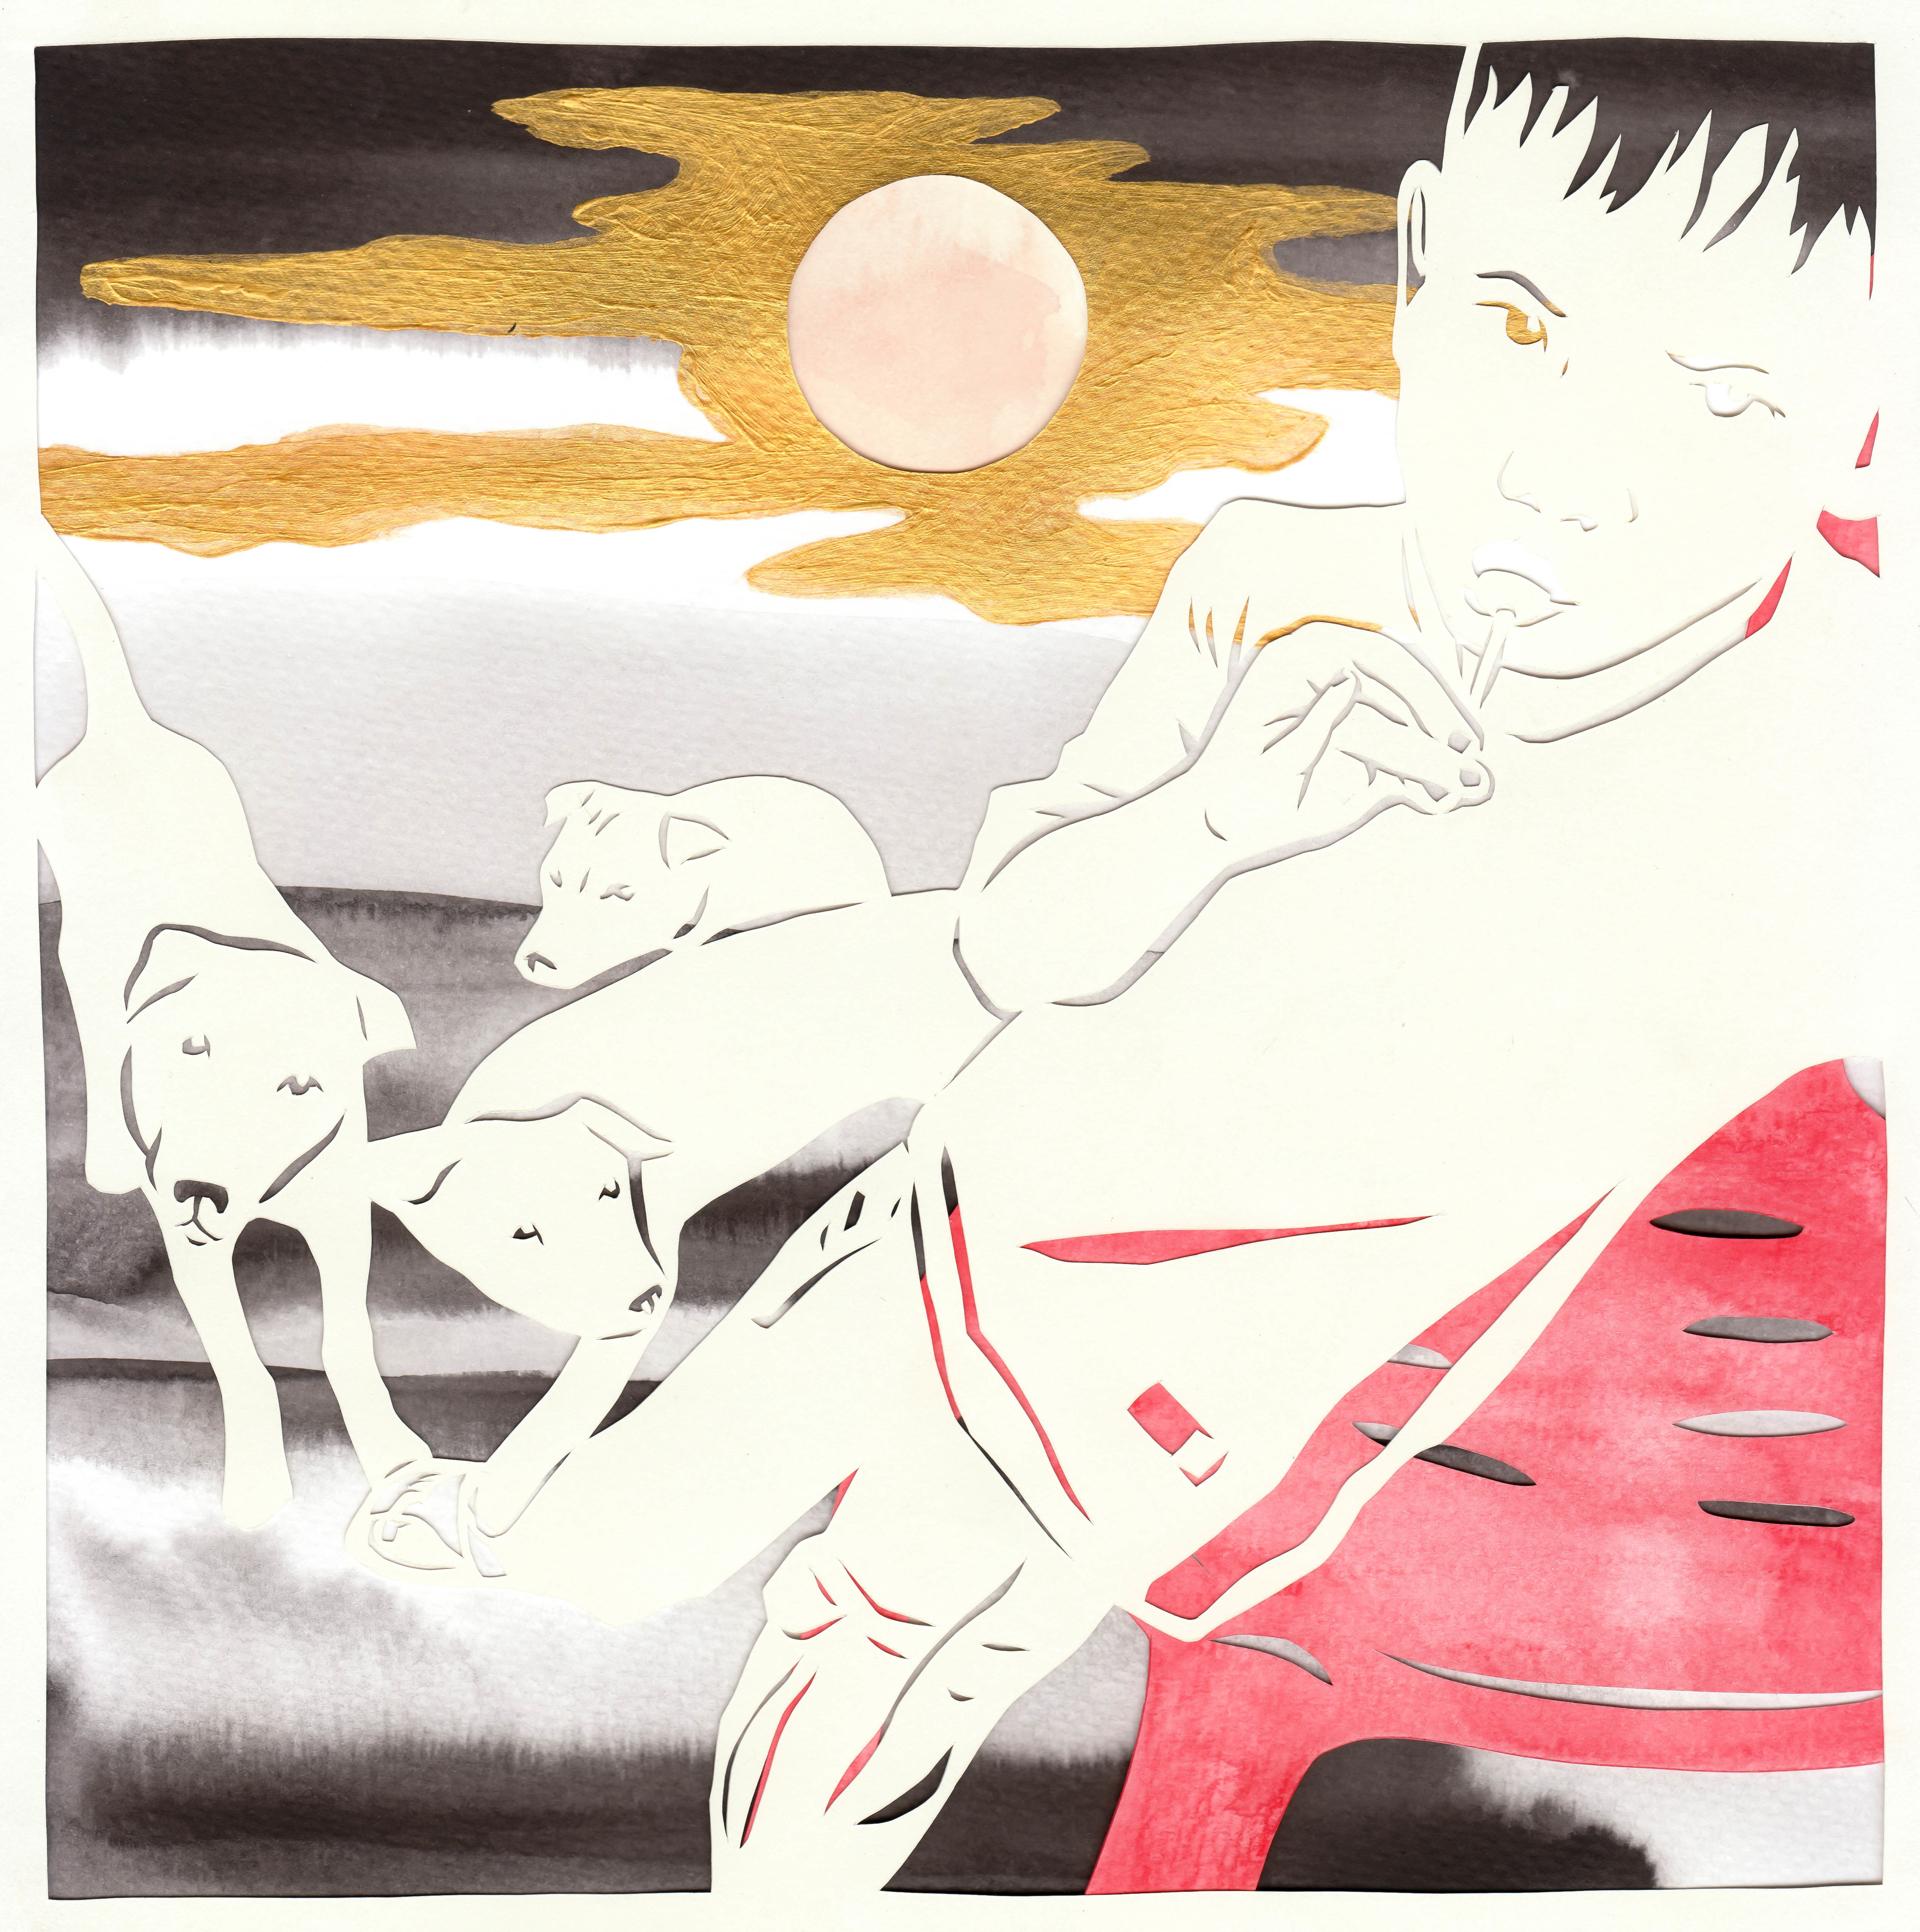 Spellbound by Lauren Iida   100 Aspects of the Moon